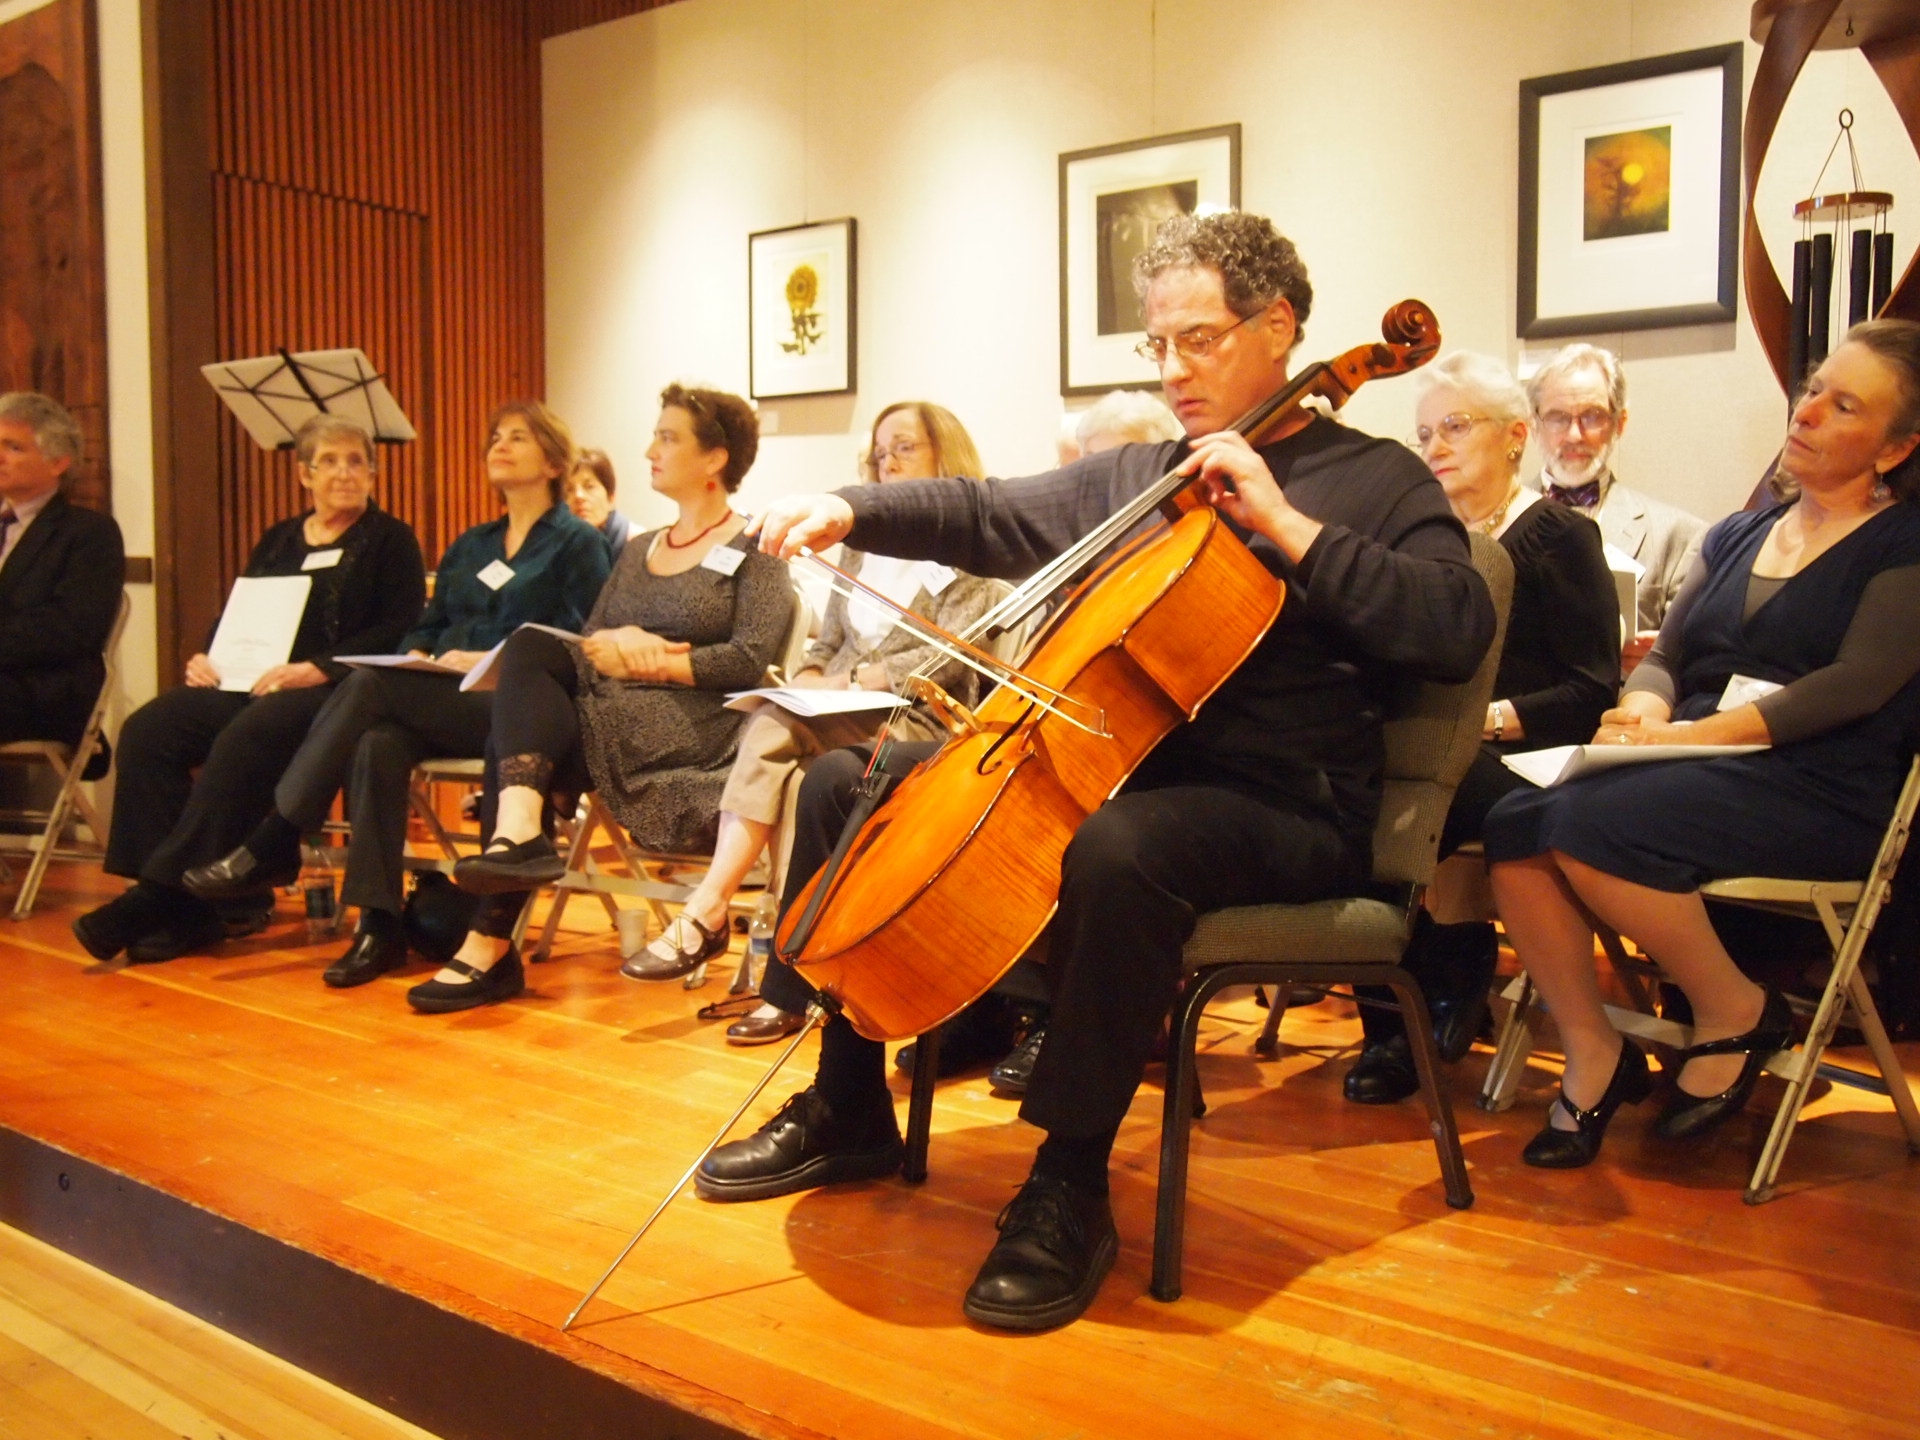 Cellist jerry bobbe plays kol nidre at yom kippur